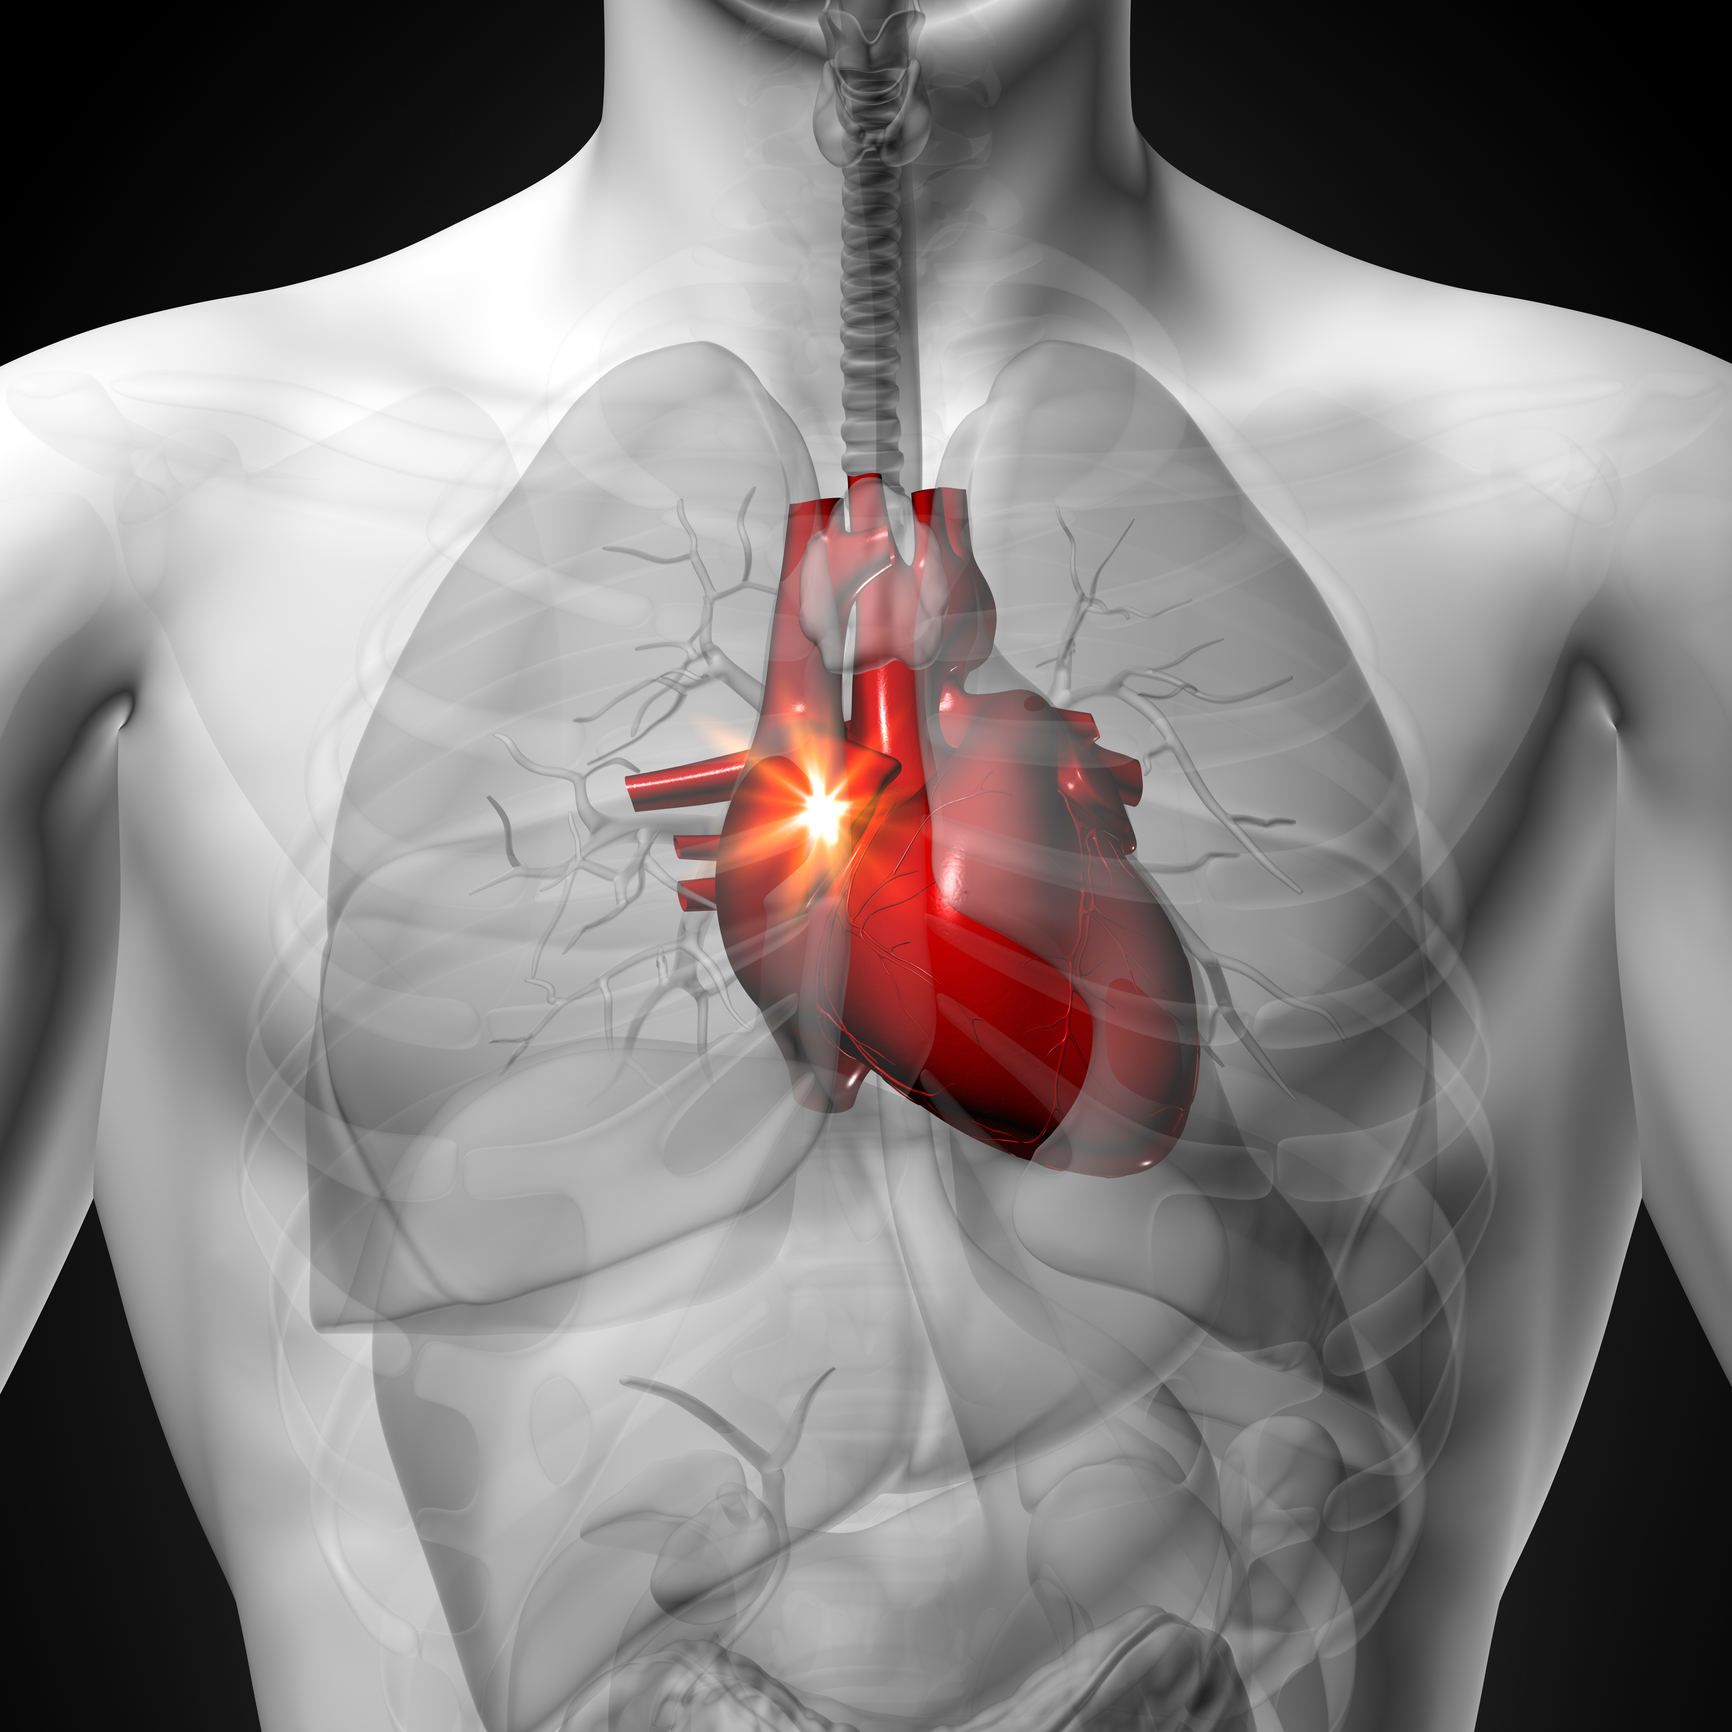 The 4 Heart Problem Symptoms You Shouldn't Ignore